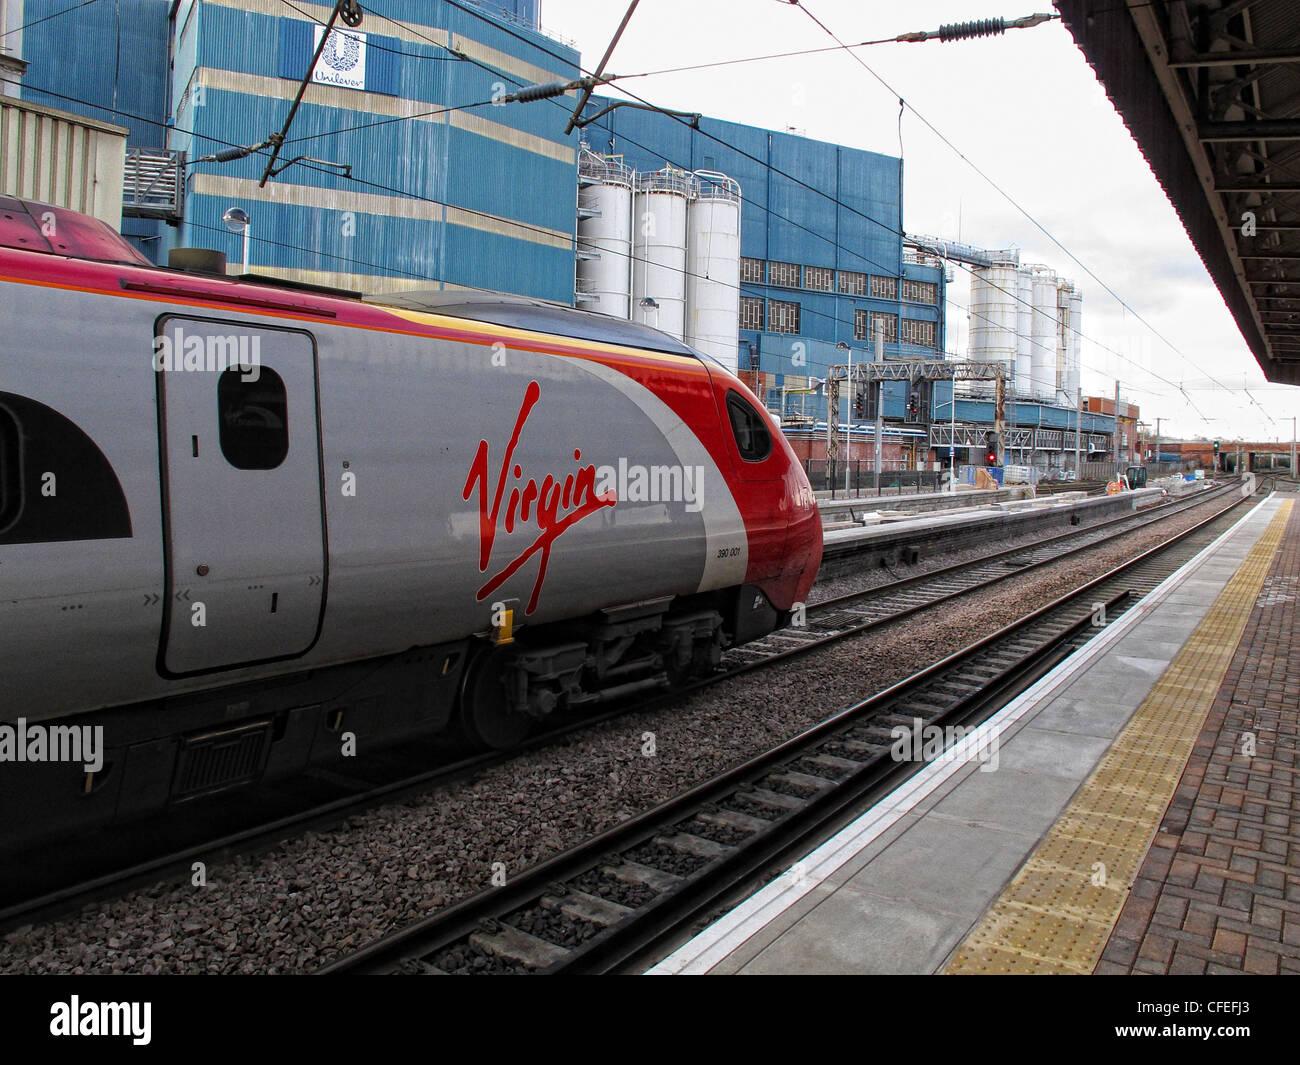 Laden Sie dieses Alamy Stockfoto Jungfrau Pendo Pendolino trainieren an Plattform drei, Warrington Bank Quay Railway Station, Parker St, Warrington, Cheshire - CFEFJ3